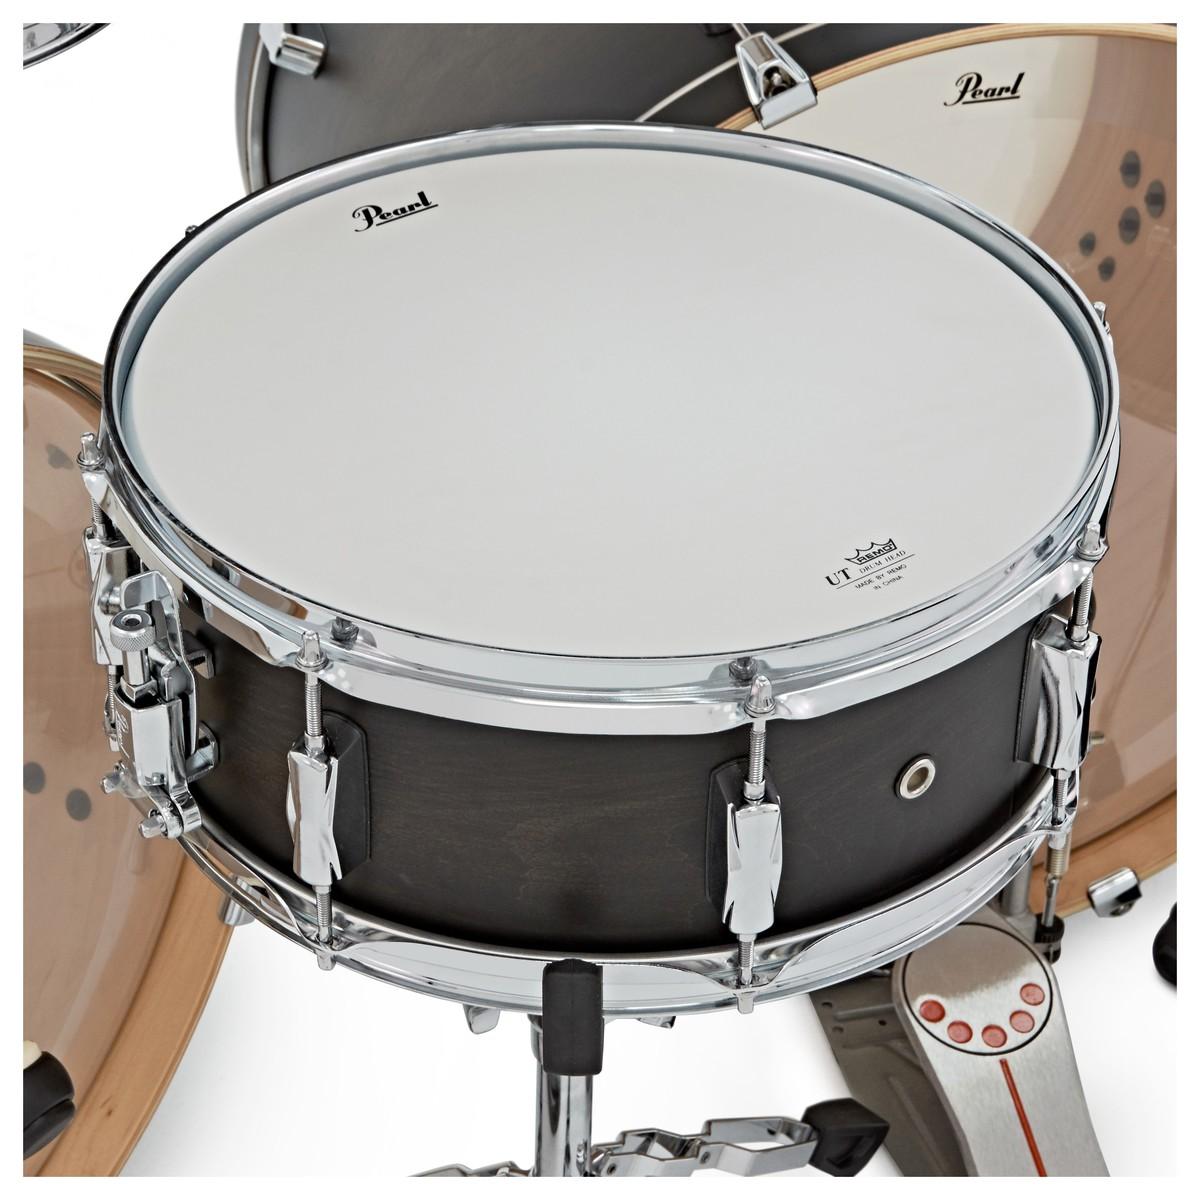 pearl decade maple 7pc double kick drum kit satin black burst at gear4music. Black Bedroom Furniture Sets. Home Design Ideas